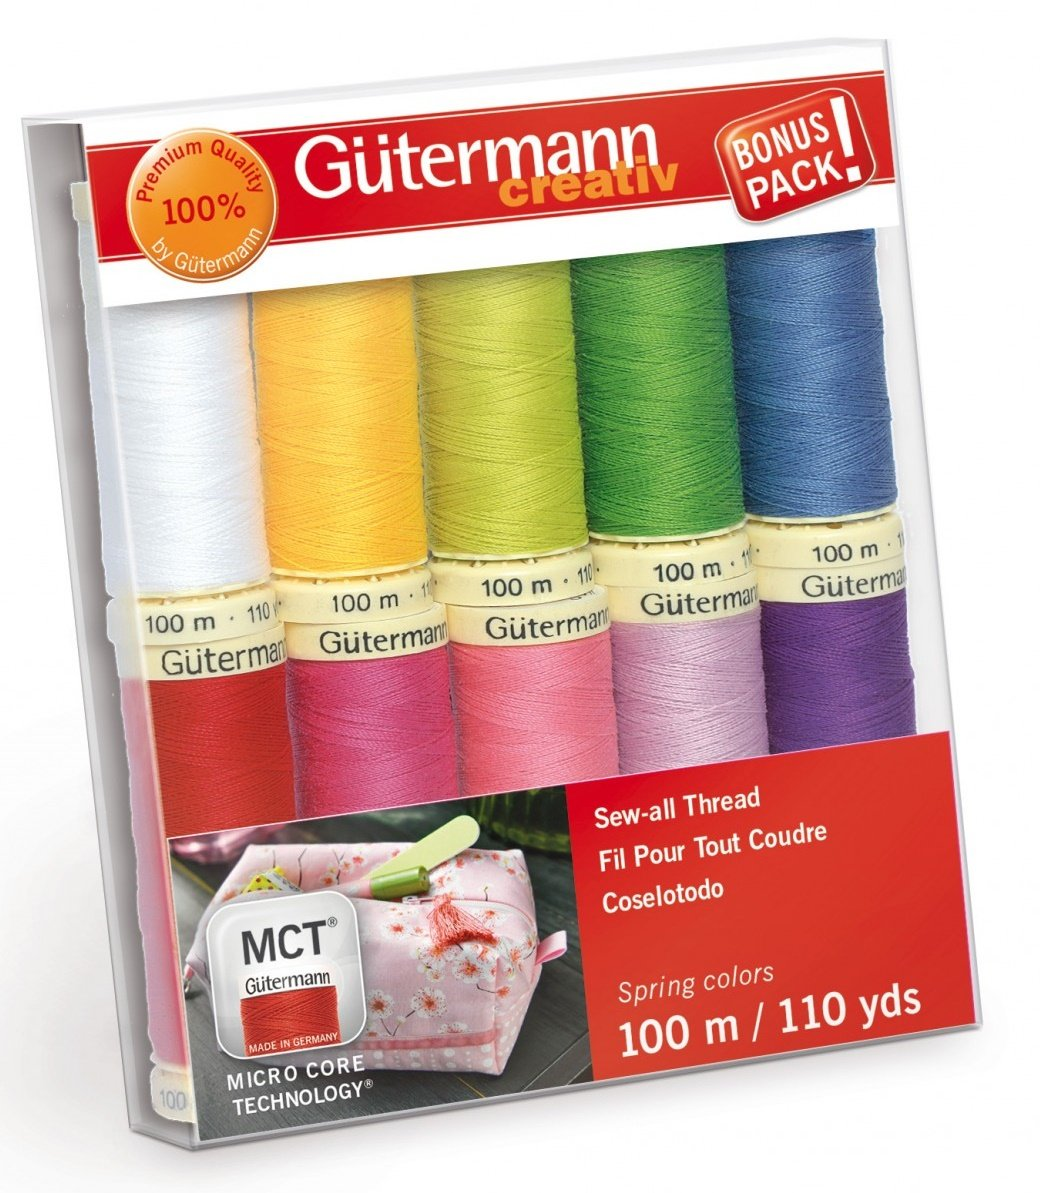 Gutermann Creativ Thread - 734014-1 Spring Sew-All Thread 10 Spools/10 Colors